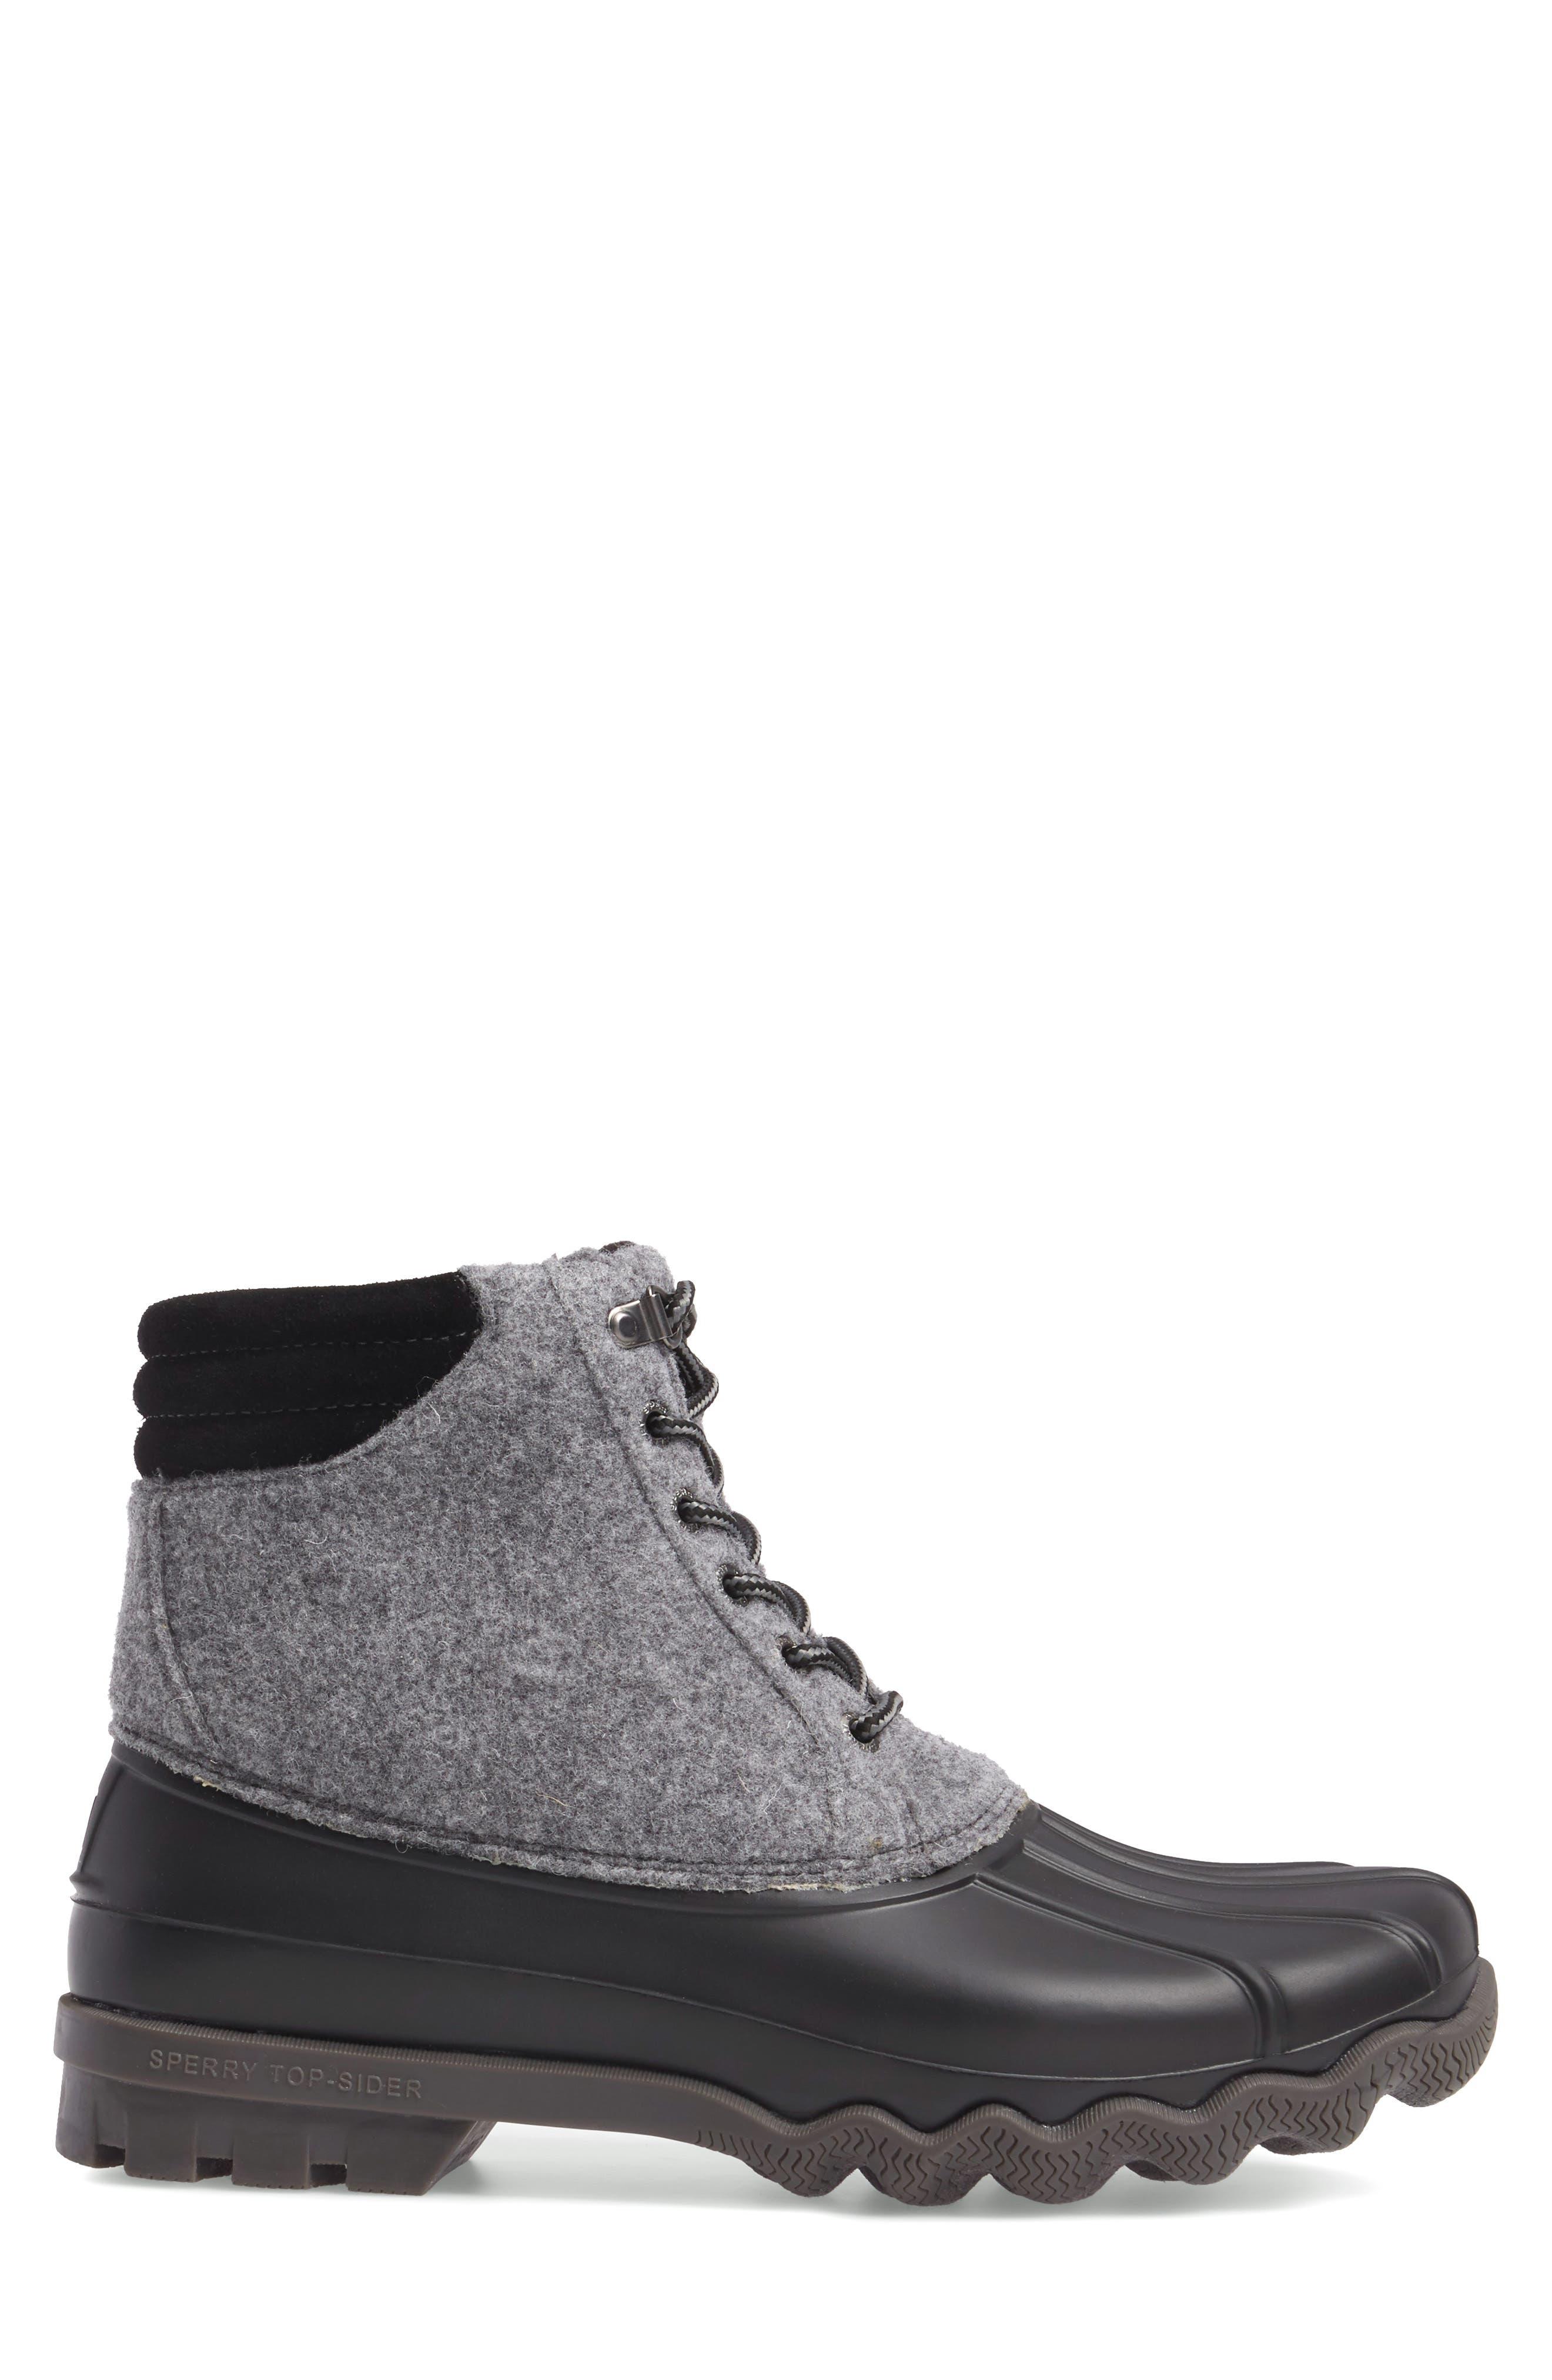 Avenue Rain Boot,                             Alternate thumbnail 3, color,                             Grey Leather